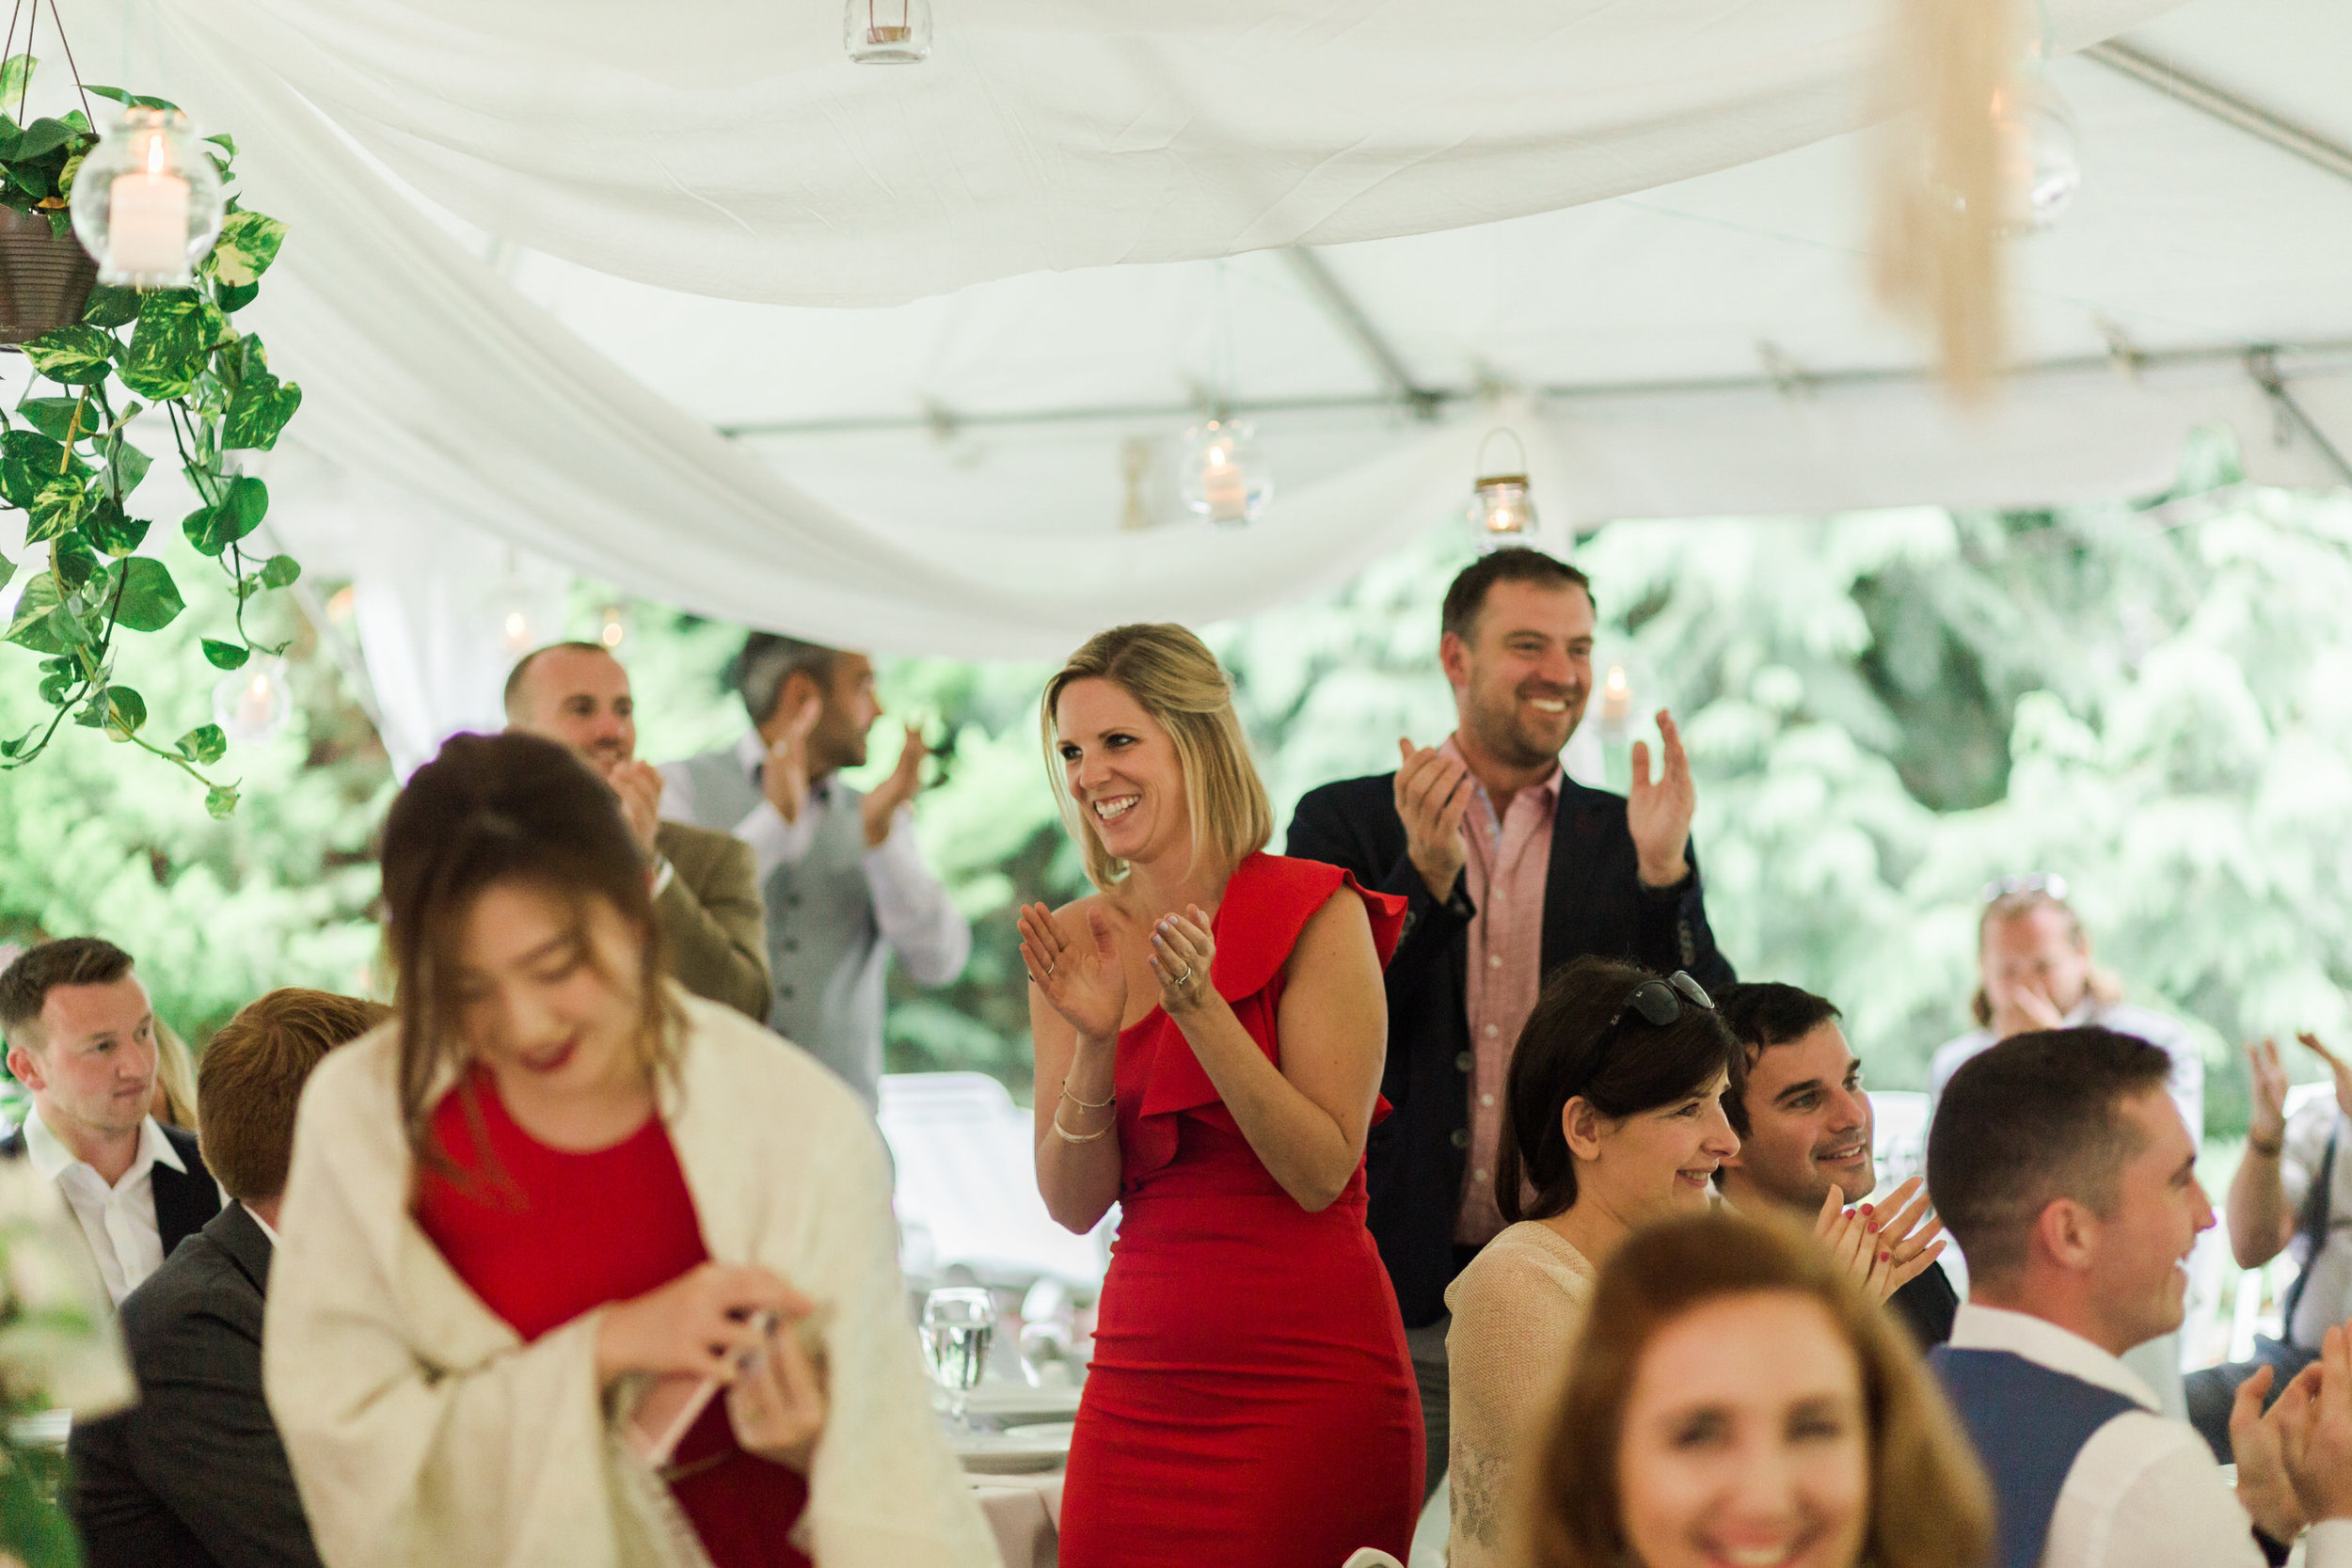 Linwood House Wedding Photos - Roberts Creek Wedding Photos - Vancouver Wedding Photographer & Videographer - Sunshine Coast Wedding Photos - Sunshine Coast Wedding Photographer - Jennifer Picard Photography - IMG_1183.jpg